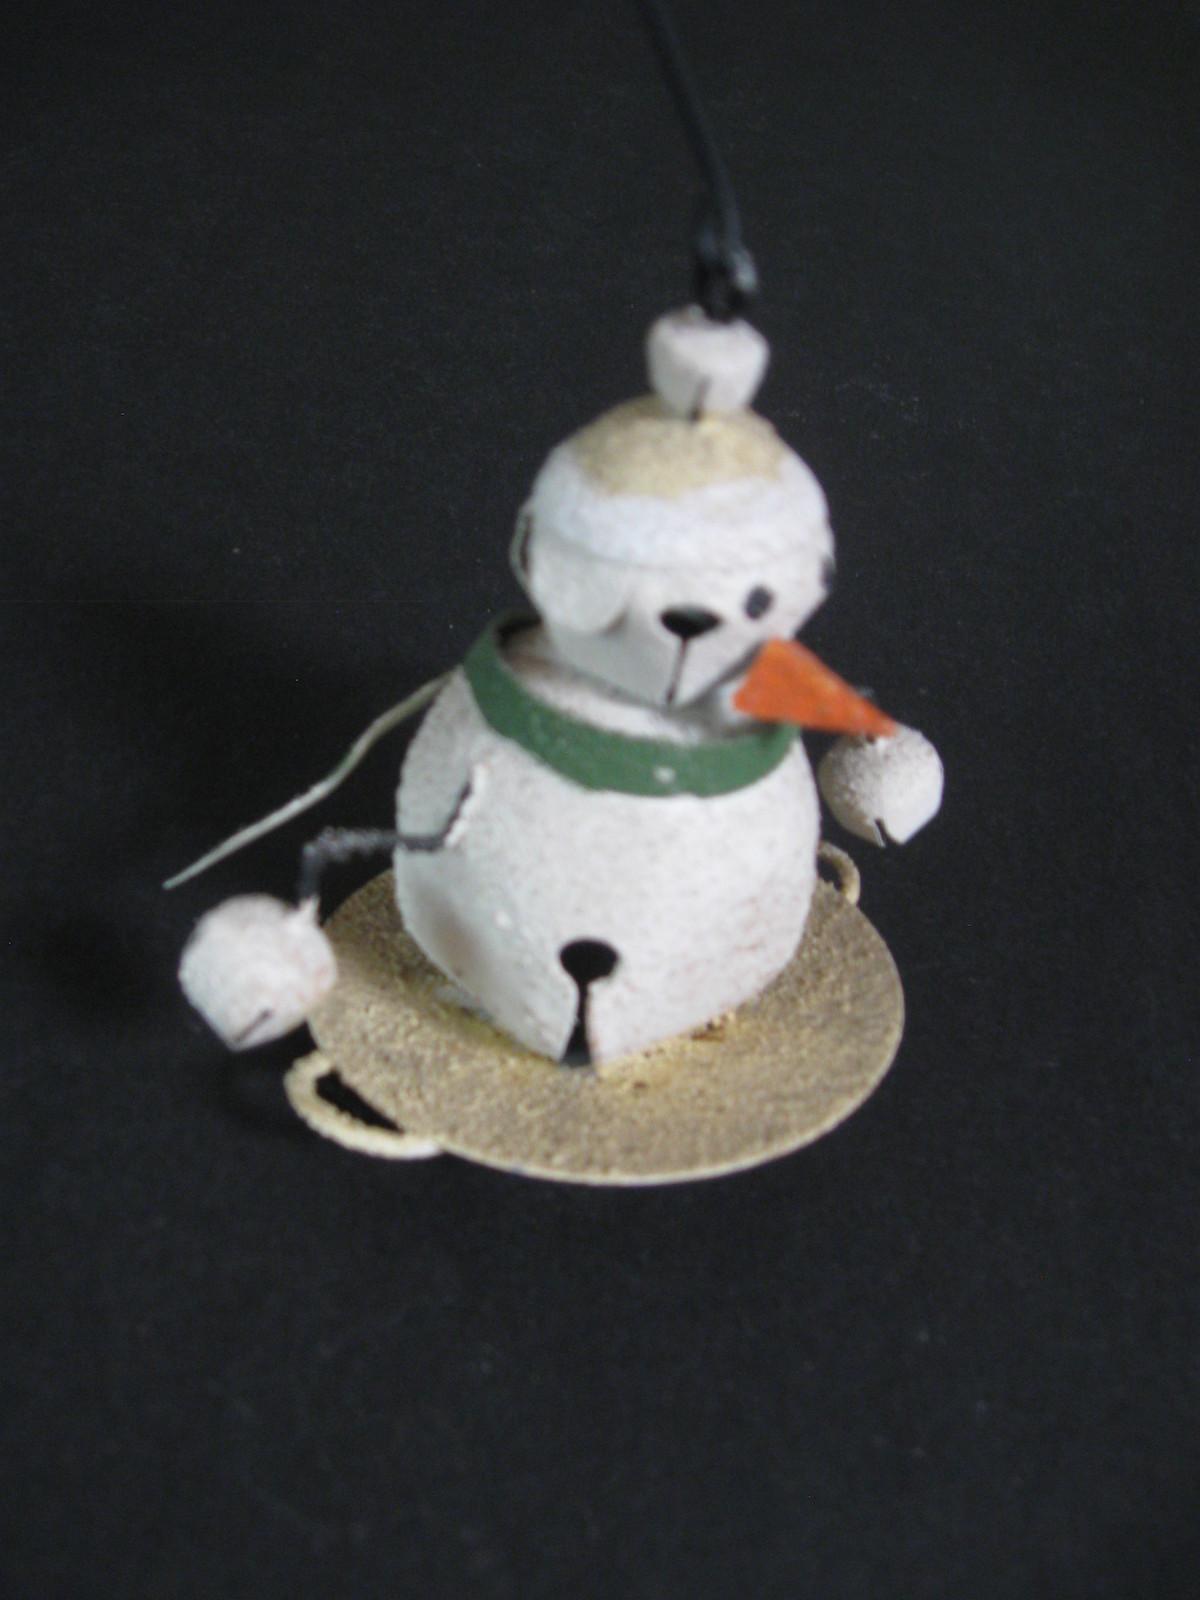 Metal Snowman Jingle Bell Ornament with Metal Hanger